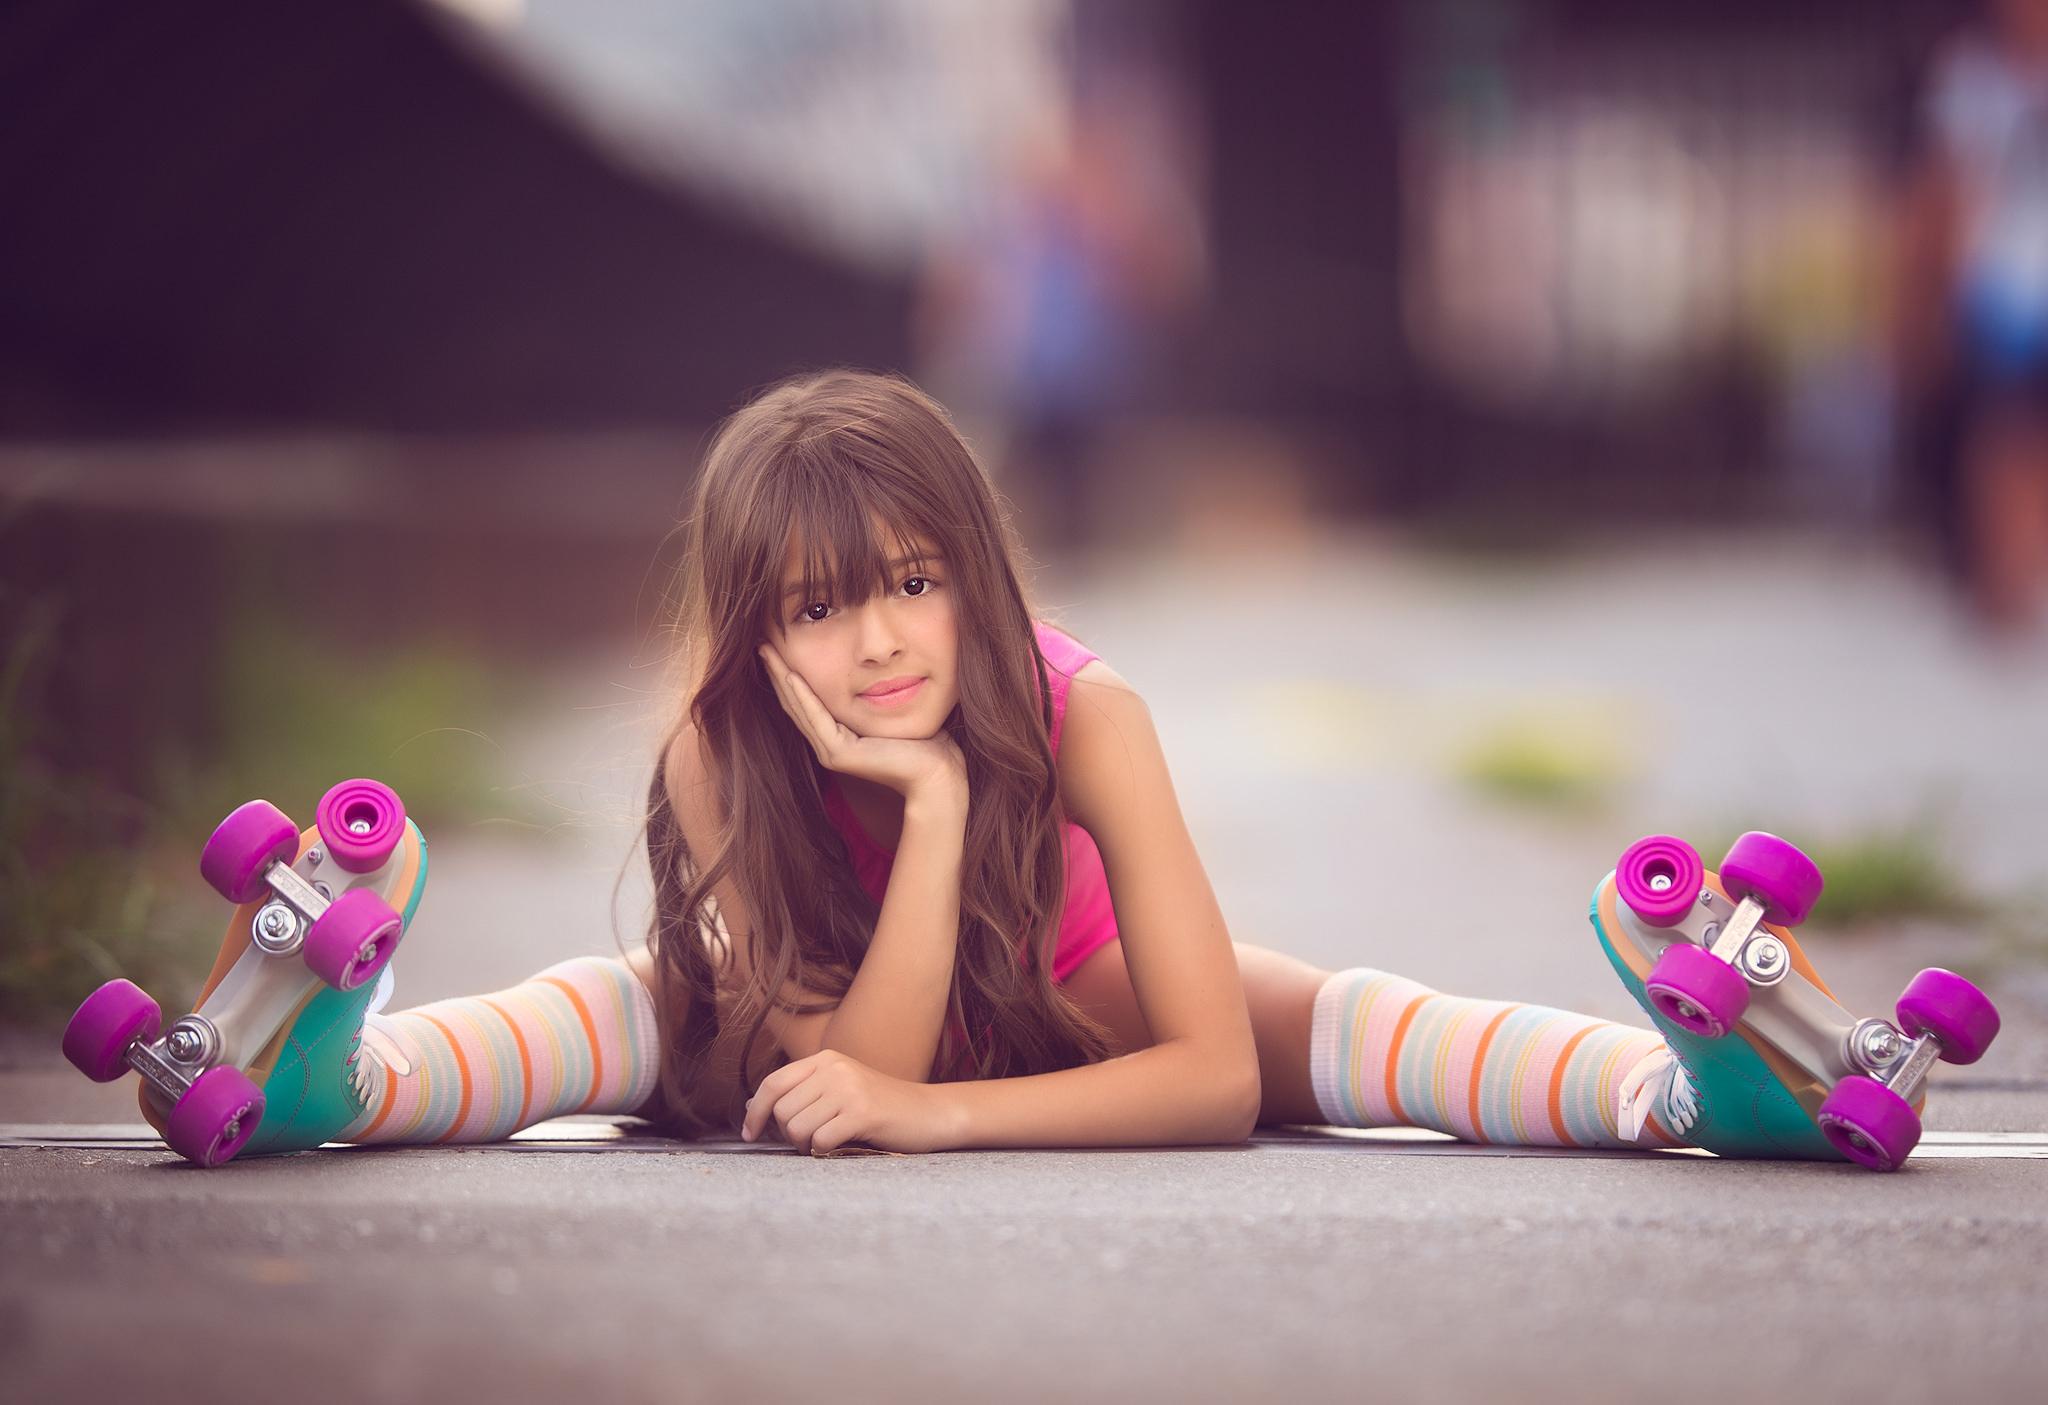 Cute Indian Girl Child Wallpaper 3840x2160 Cute Little Girl Skater 4k Hd 4k Wallpapers